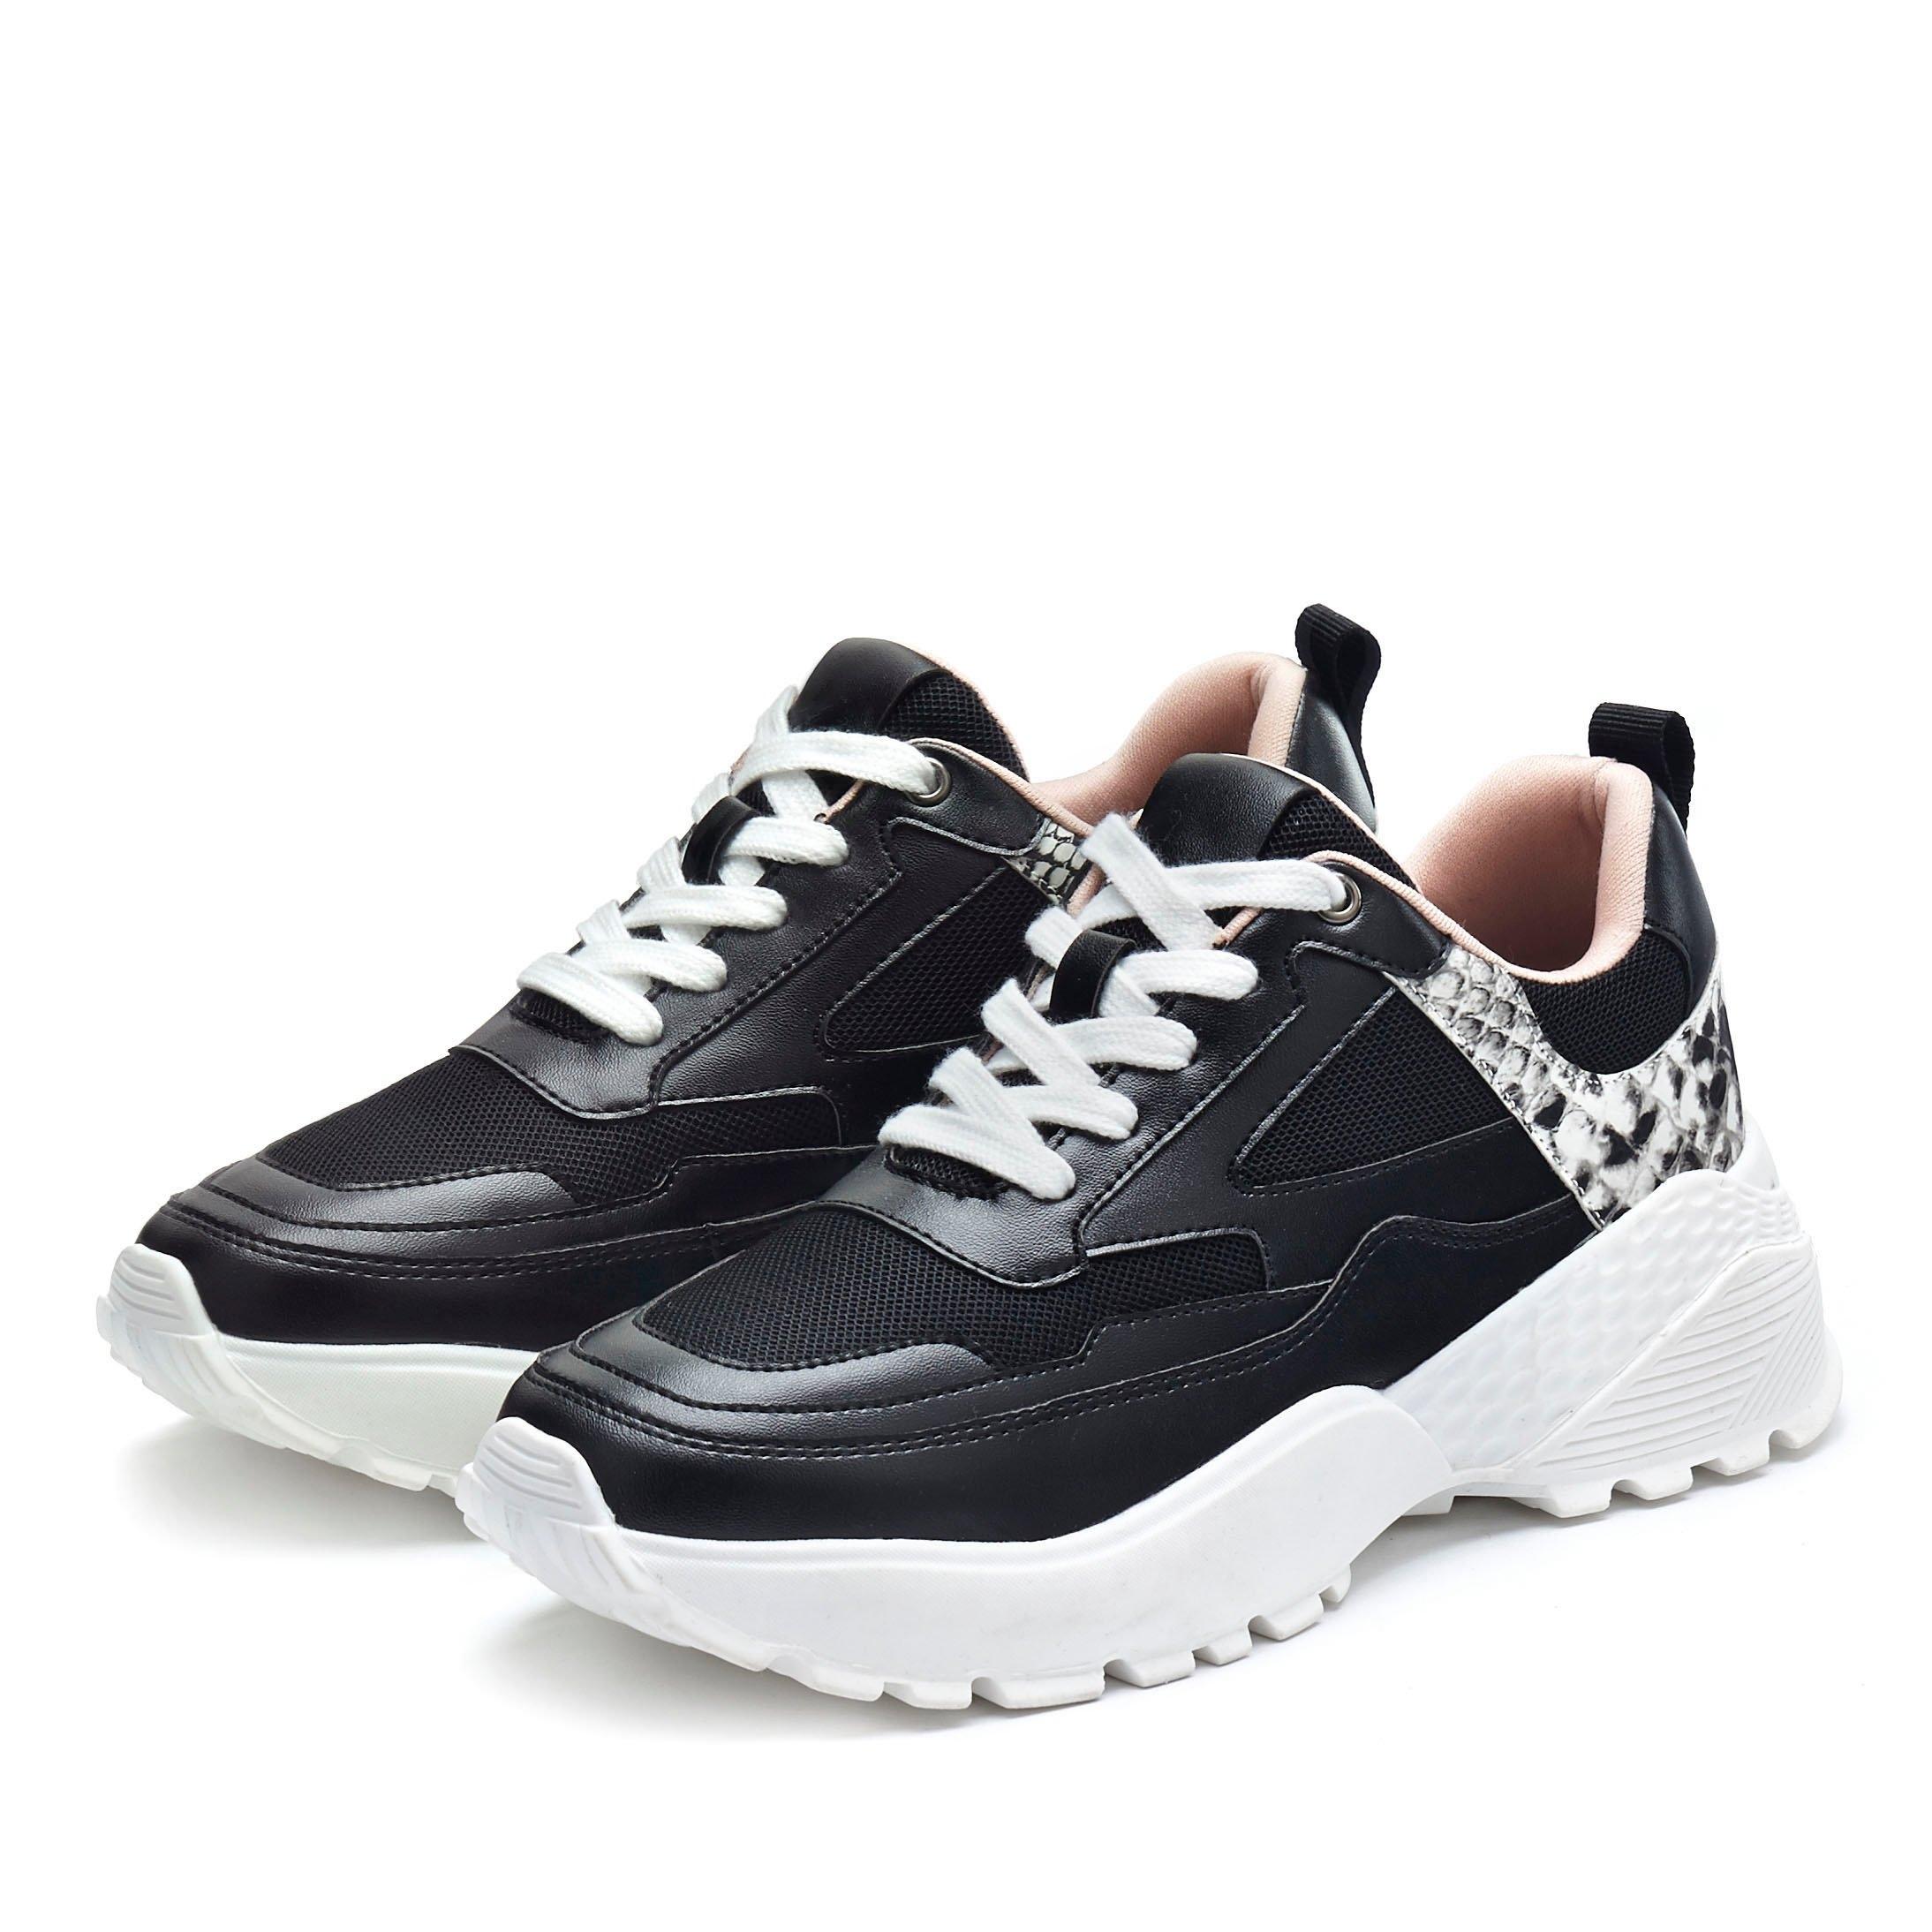 Lascana sneakers met plateauzool en trendy animal-print - verschillende betaalmethodes